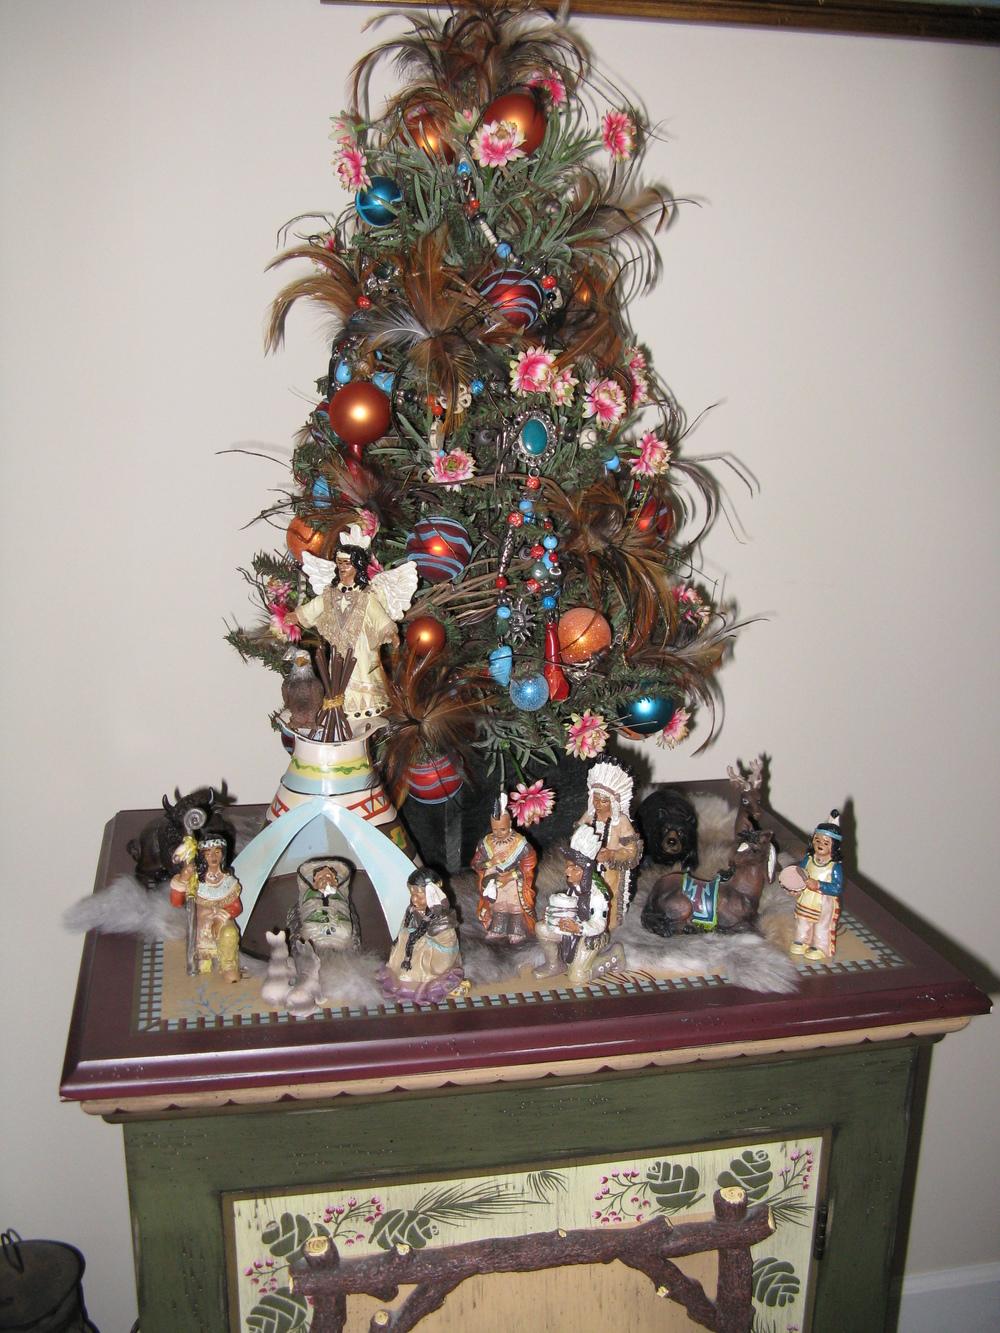 Indian Nativity Scene - Gary's work